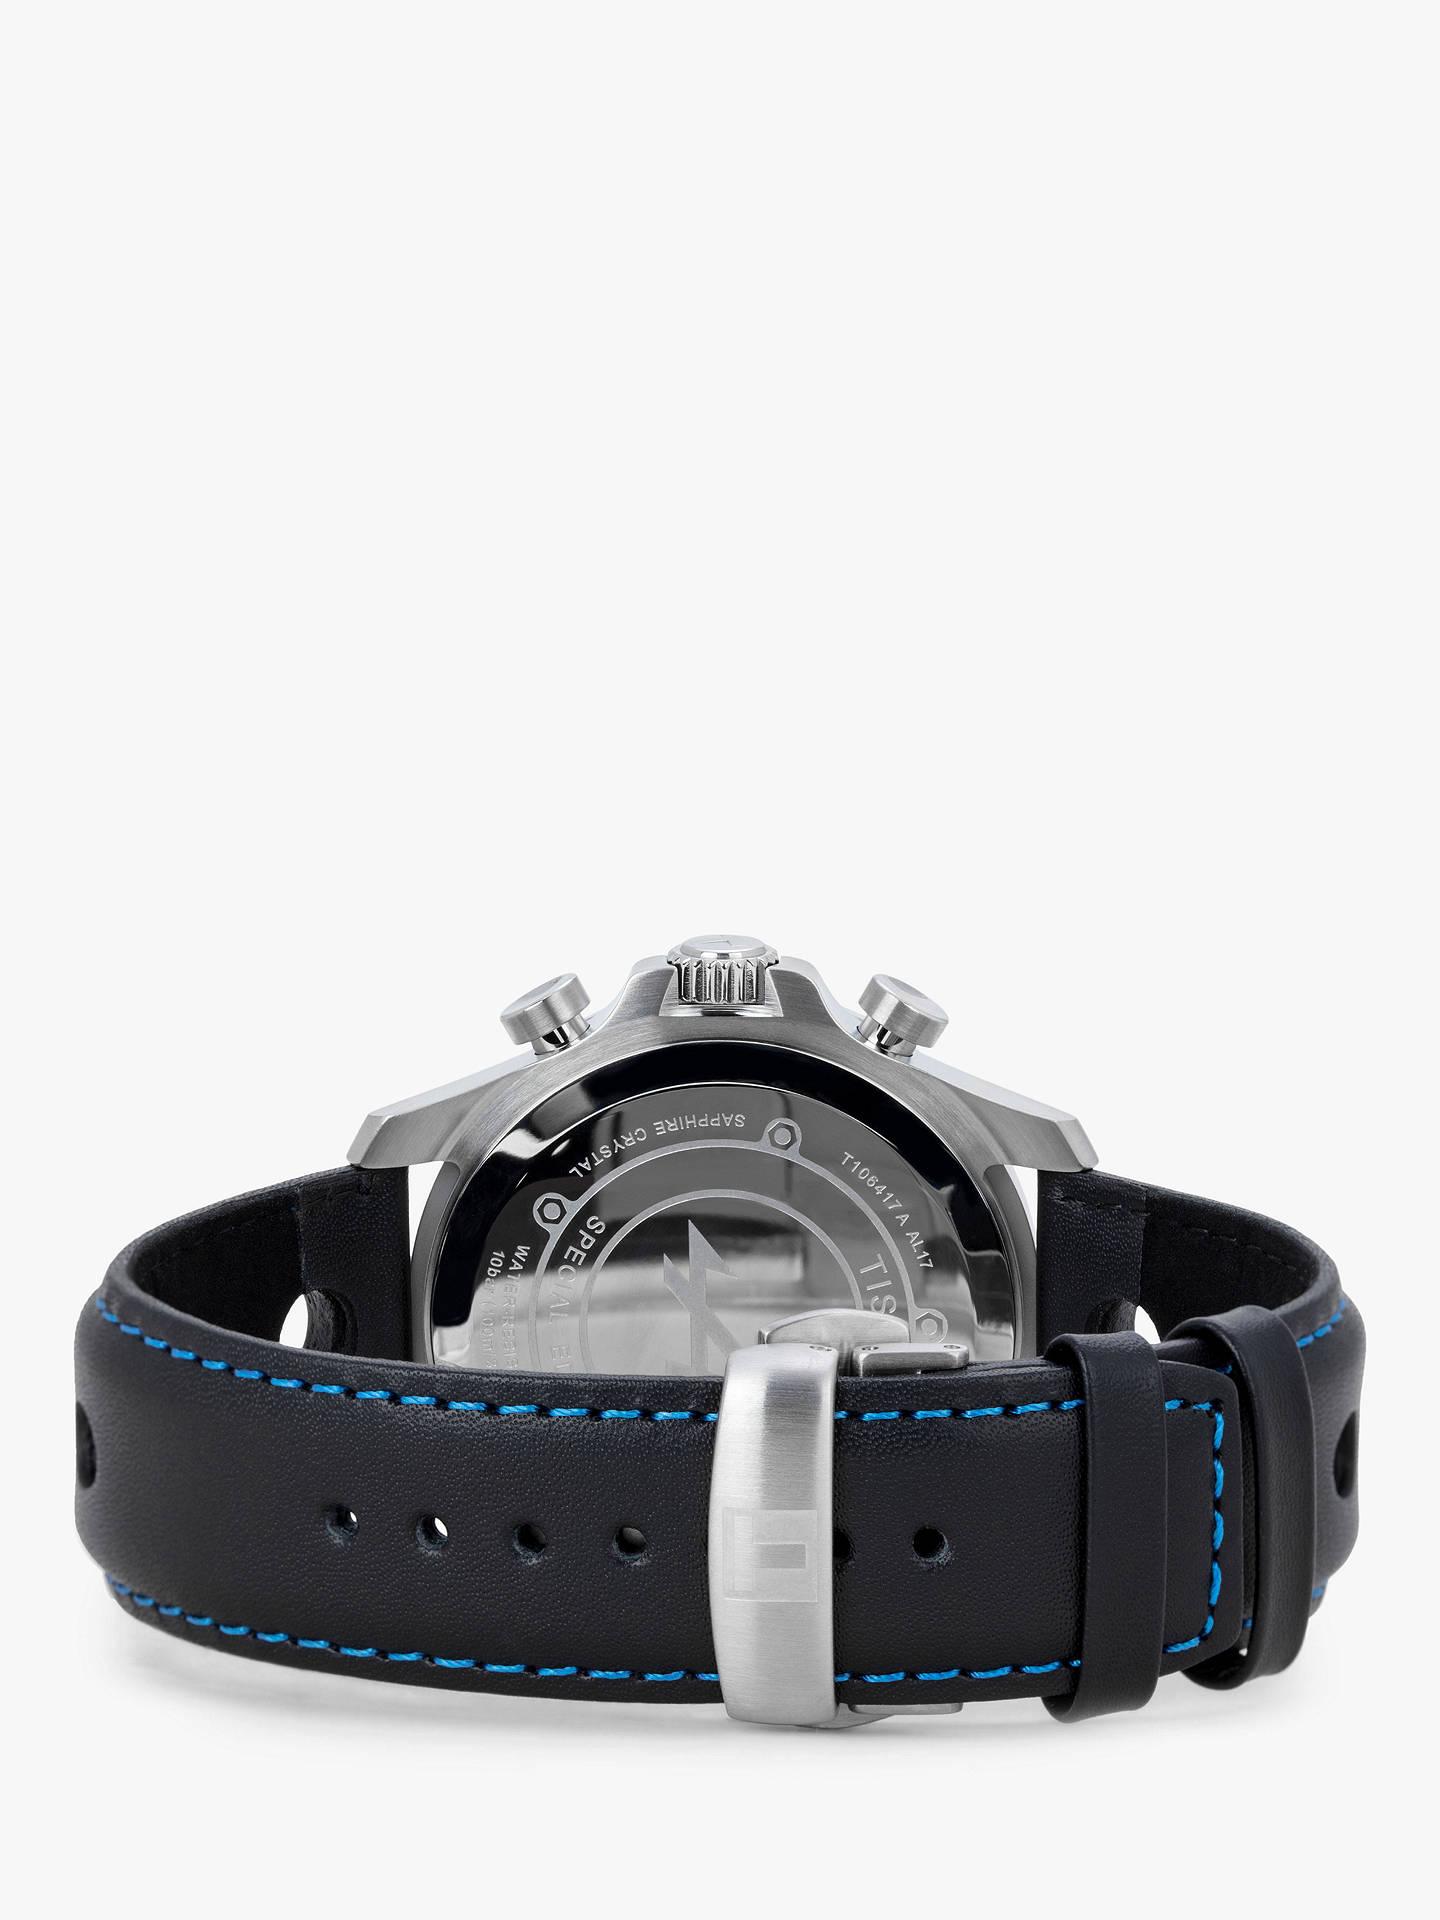 Tissot T1064171620101 Men S V8 Alpine Chronograph Date Leather Strap